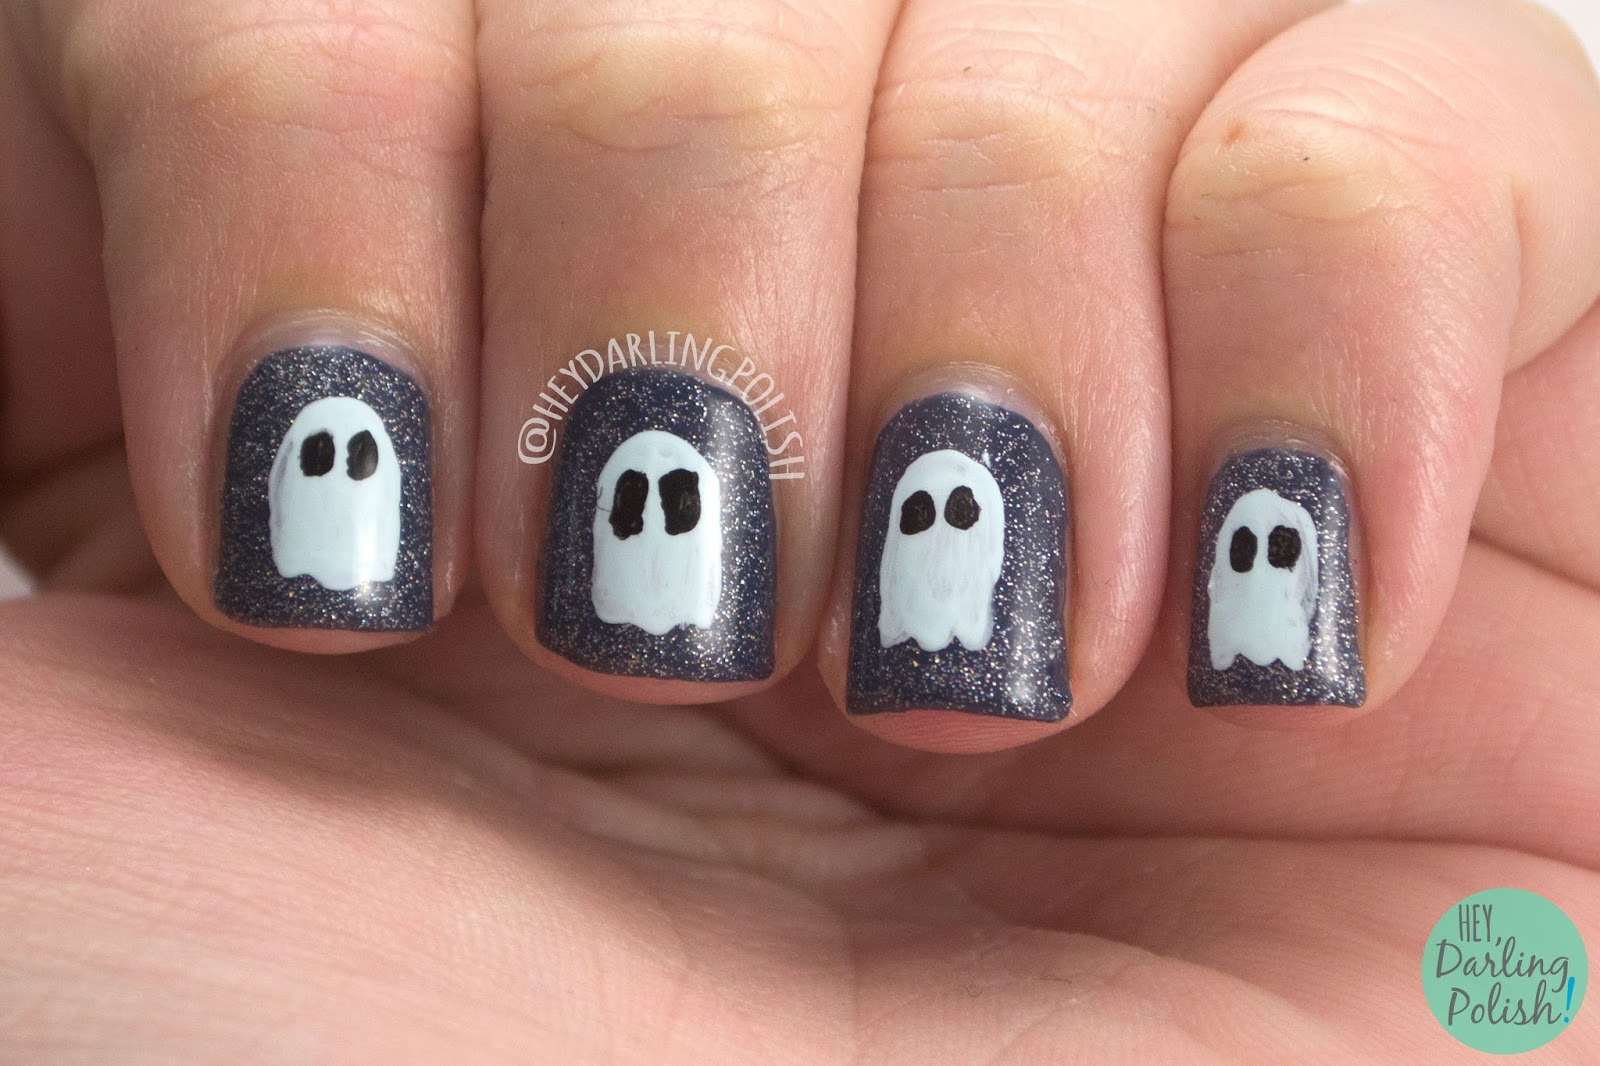 ghosts, blue, glitter, luminosity, nails, nail art, nail polish, indie polish, indie, liquid kandi, october sweet treat box, halloween,